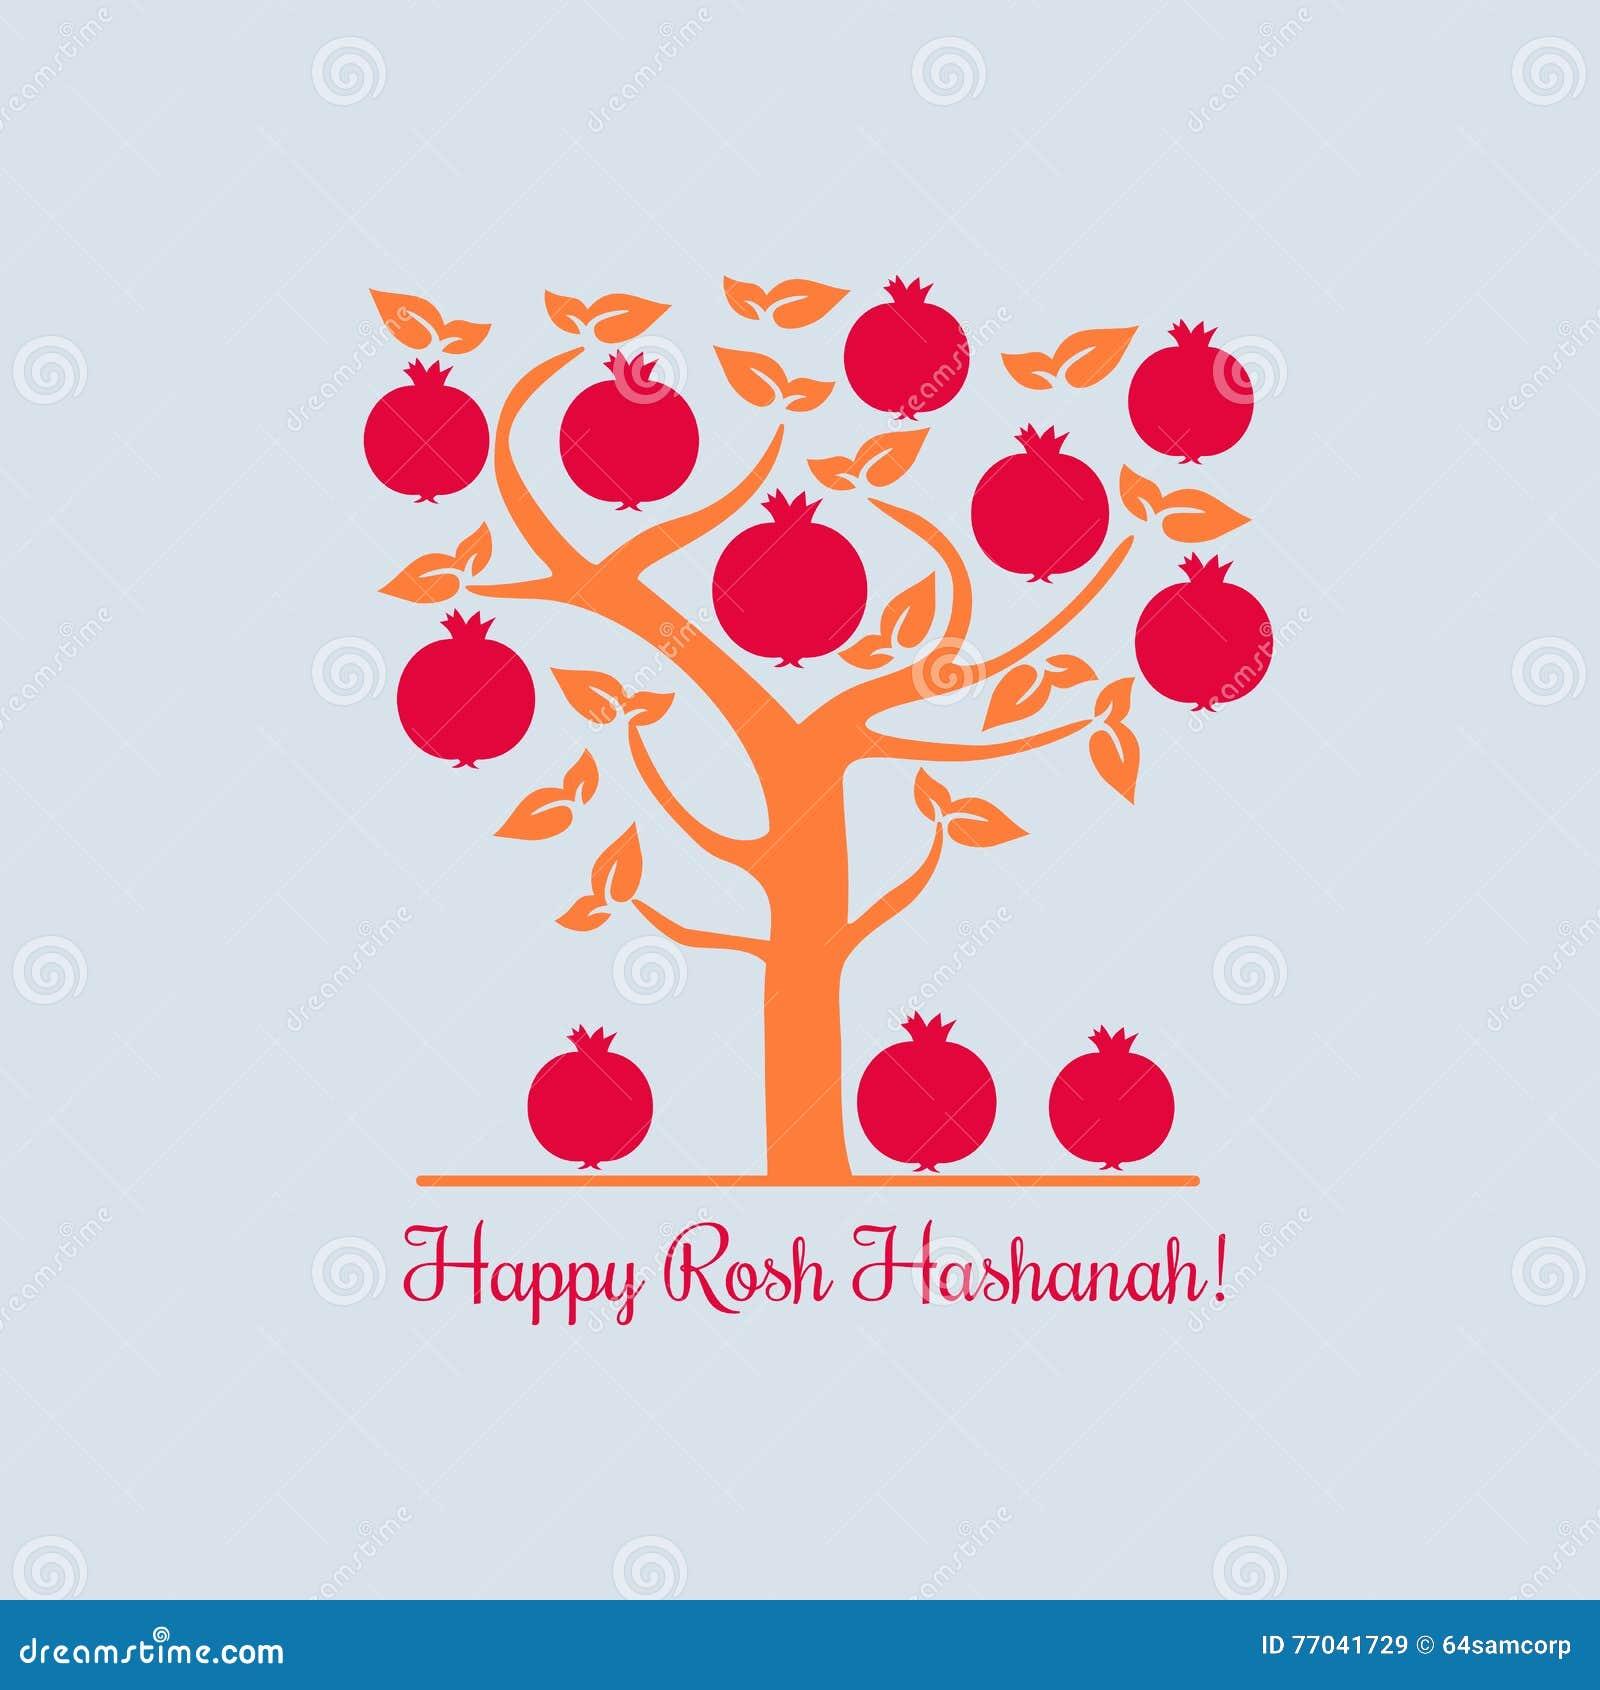 Happy Rosh Hashana Stock Vector Illustration Of Healthy 77041729